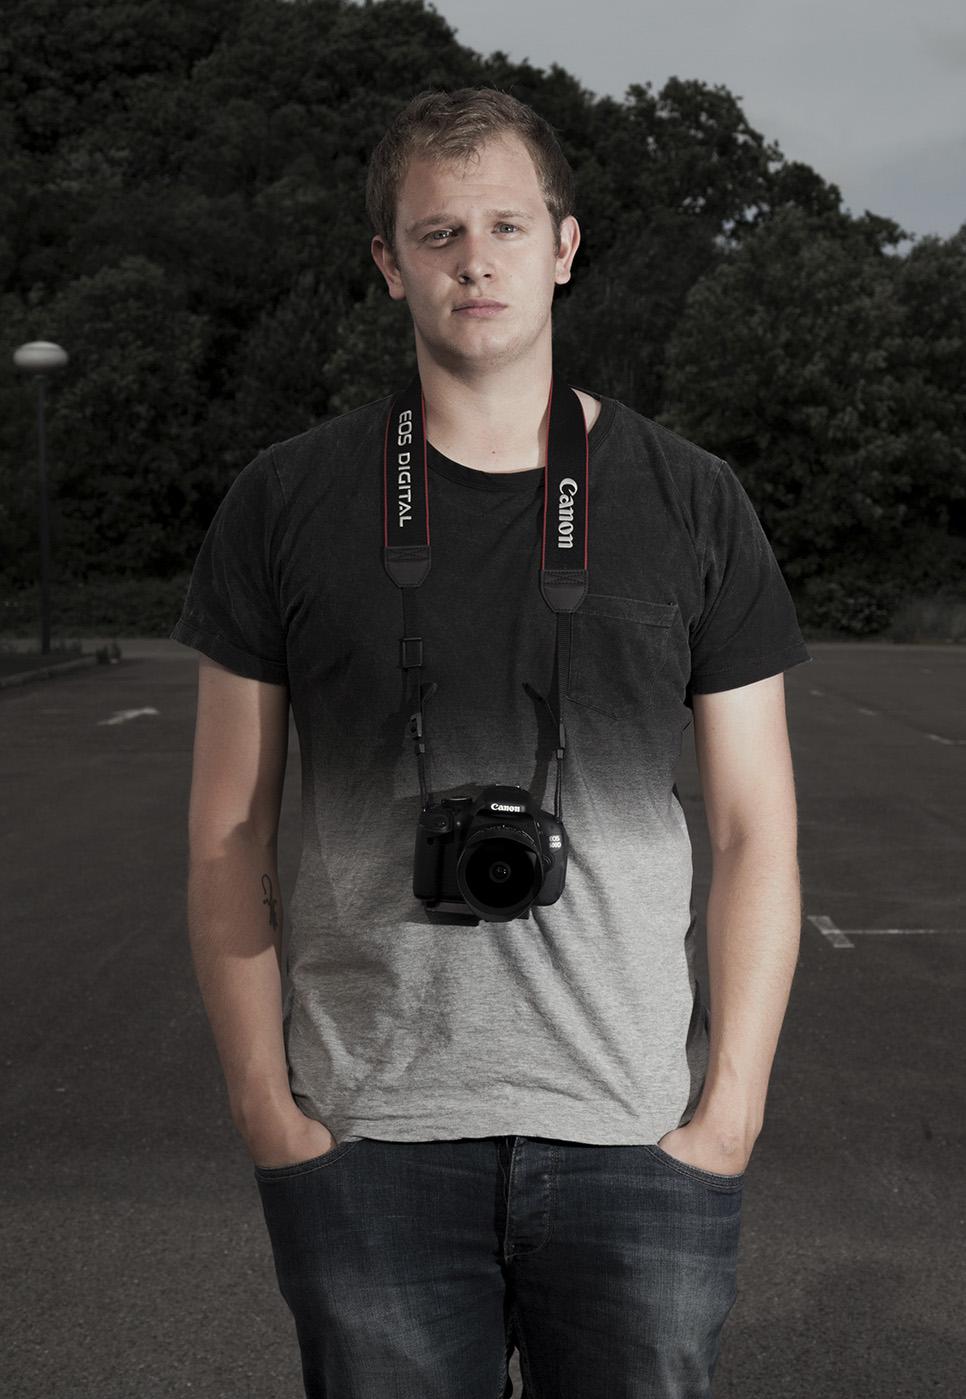 Ryan Goold